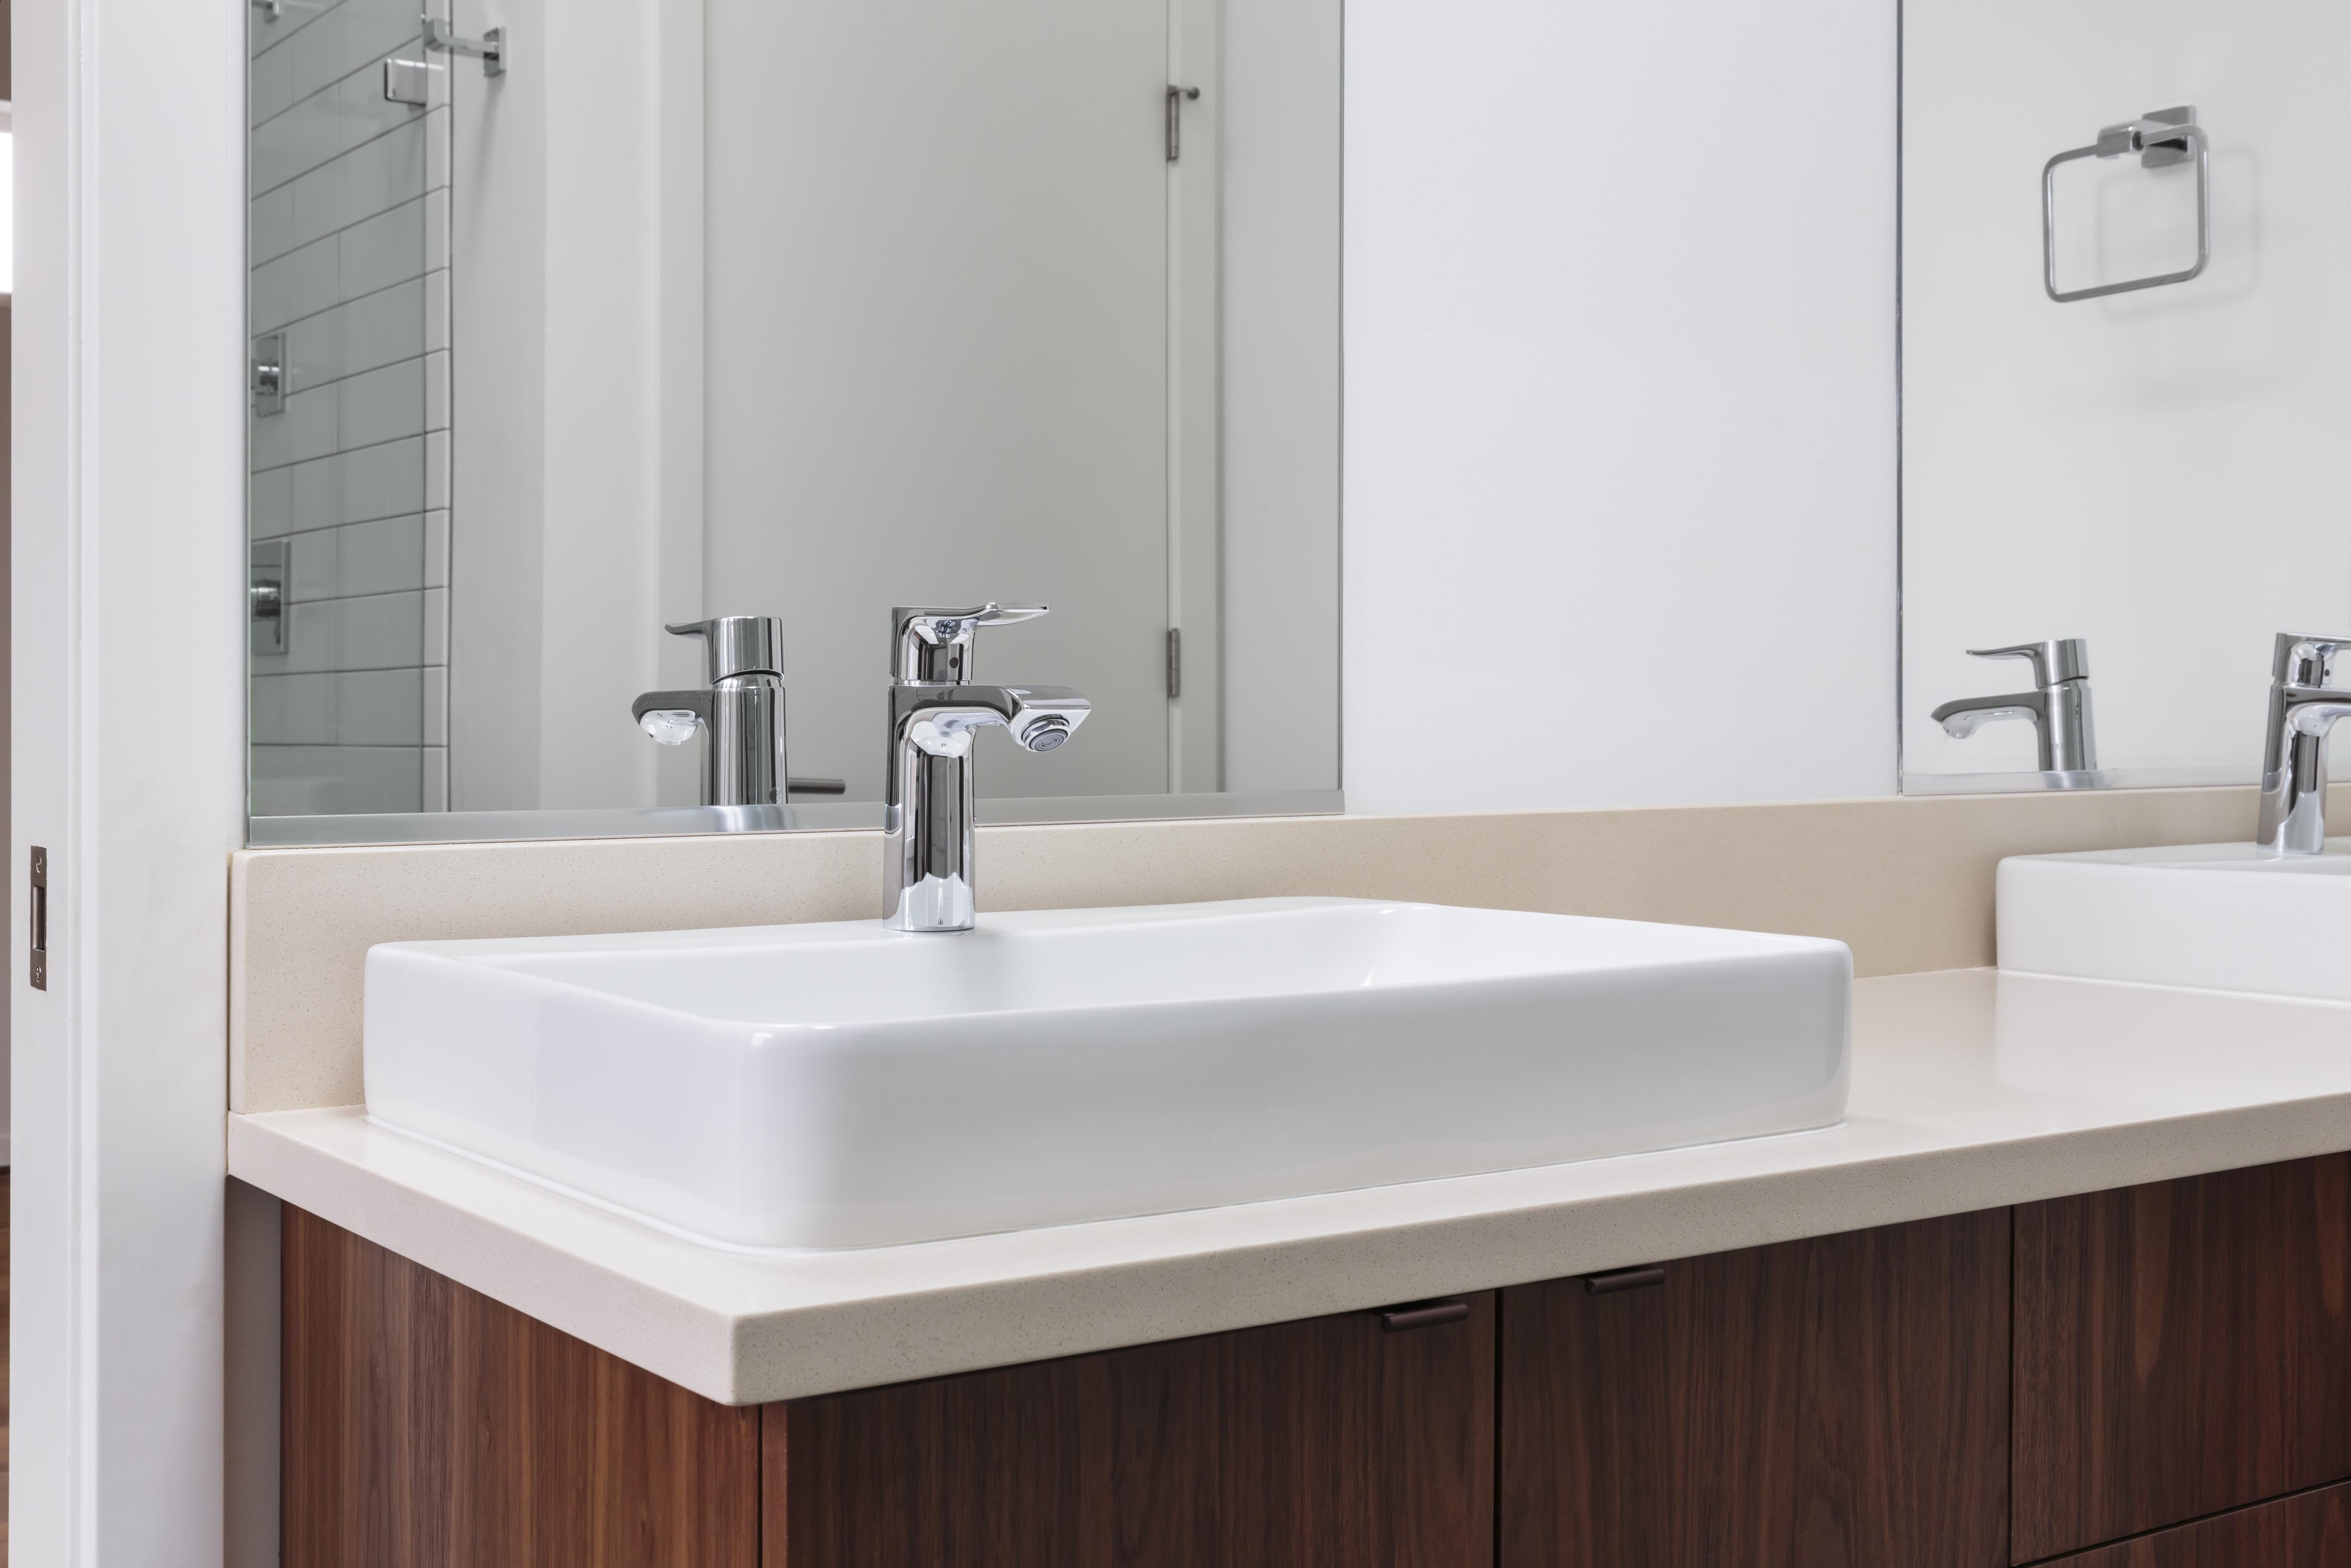 How To Choose A Bathroom Mirror Size Home Guides Sf Gate